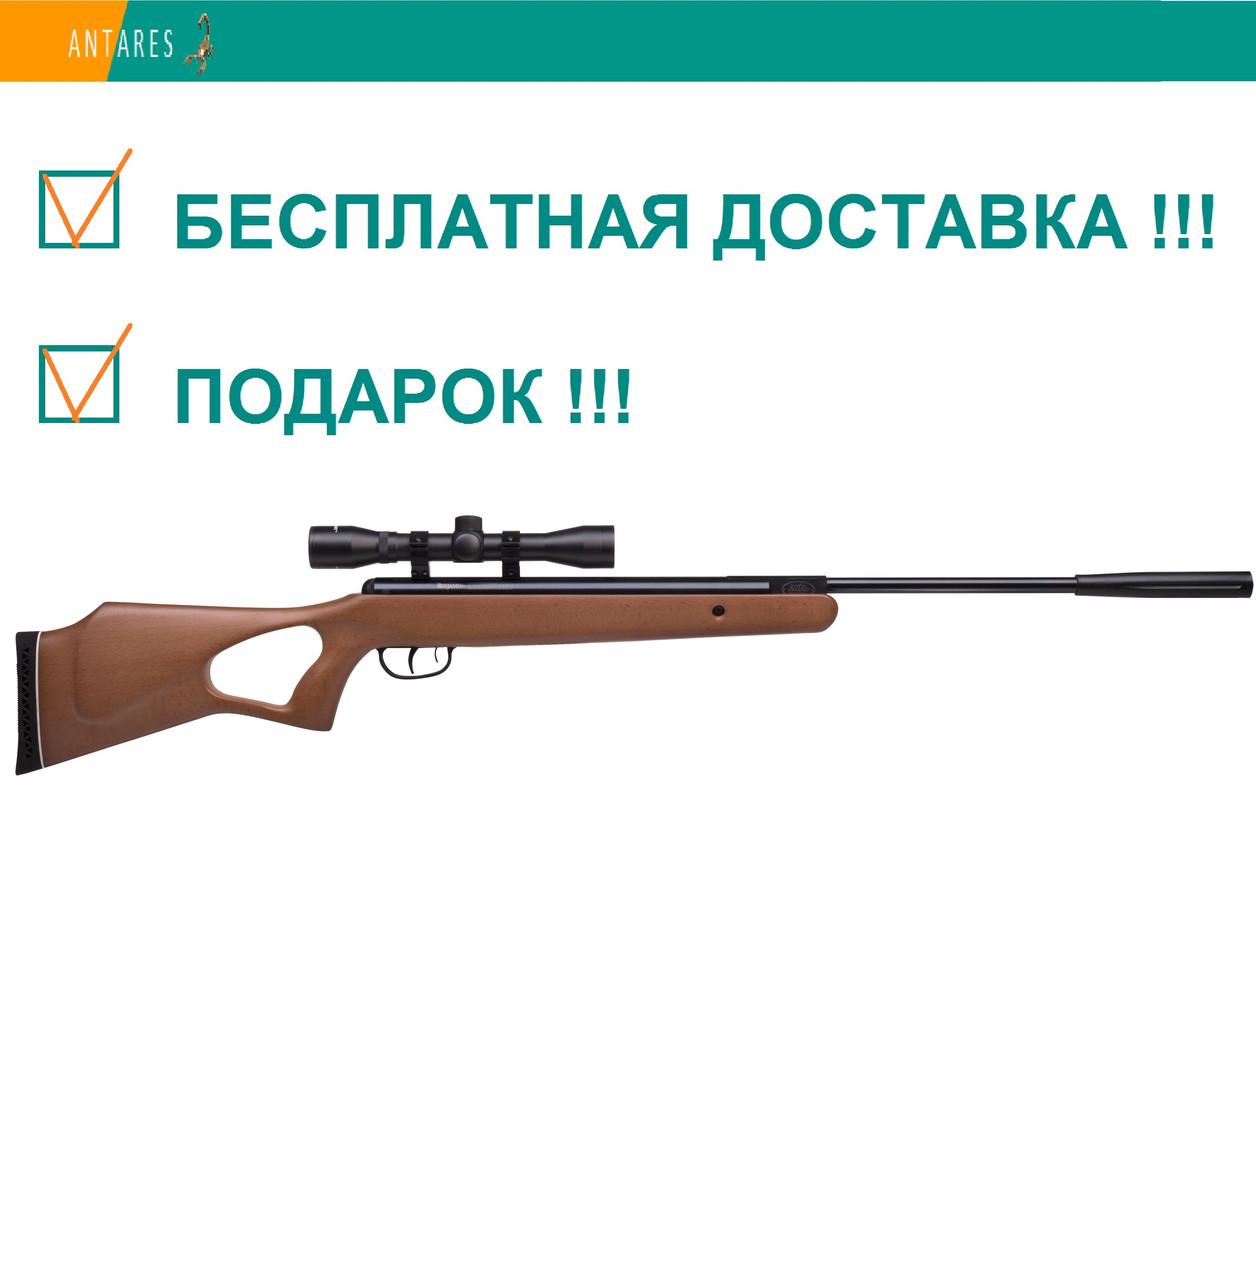 Пневматическая винтовка Crosman Benjamin Titan NP RM BW1K77NP с ОП 4×32 дерево газовая пружина 305 м/с